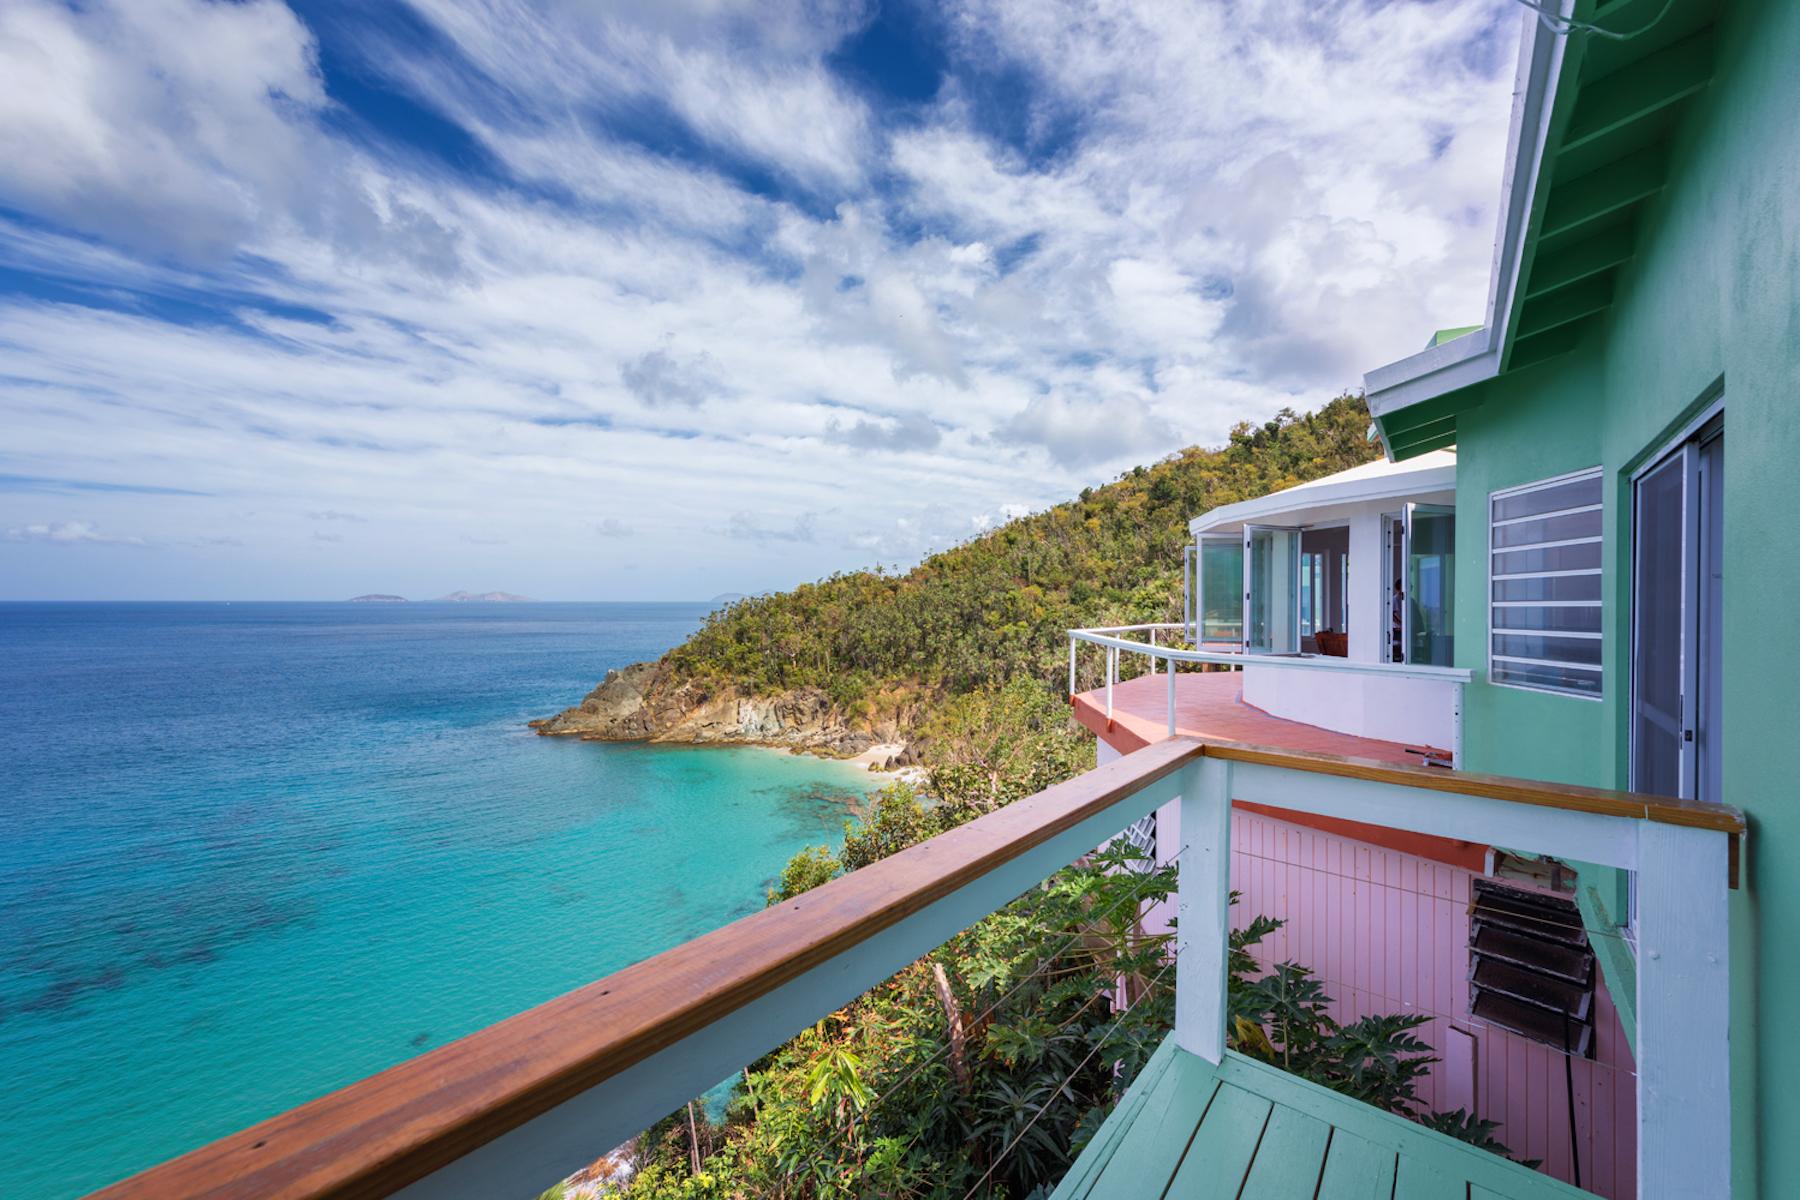 Single Family Homes für Verkauf beim 4-44 Tabor & Harmony St Thomas, Virgin Islands 00802 Amerikanische Jungferninseln